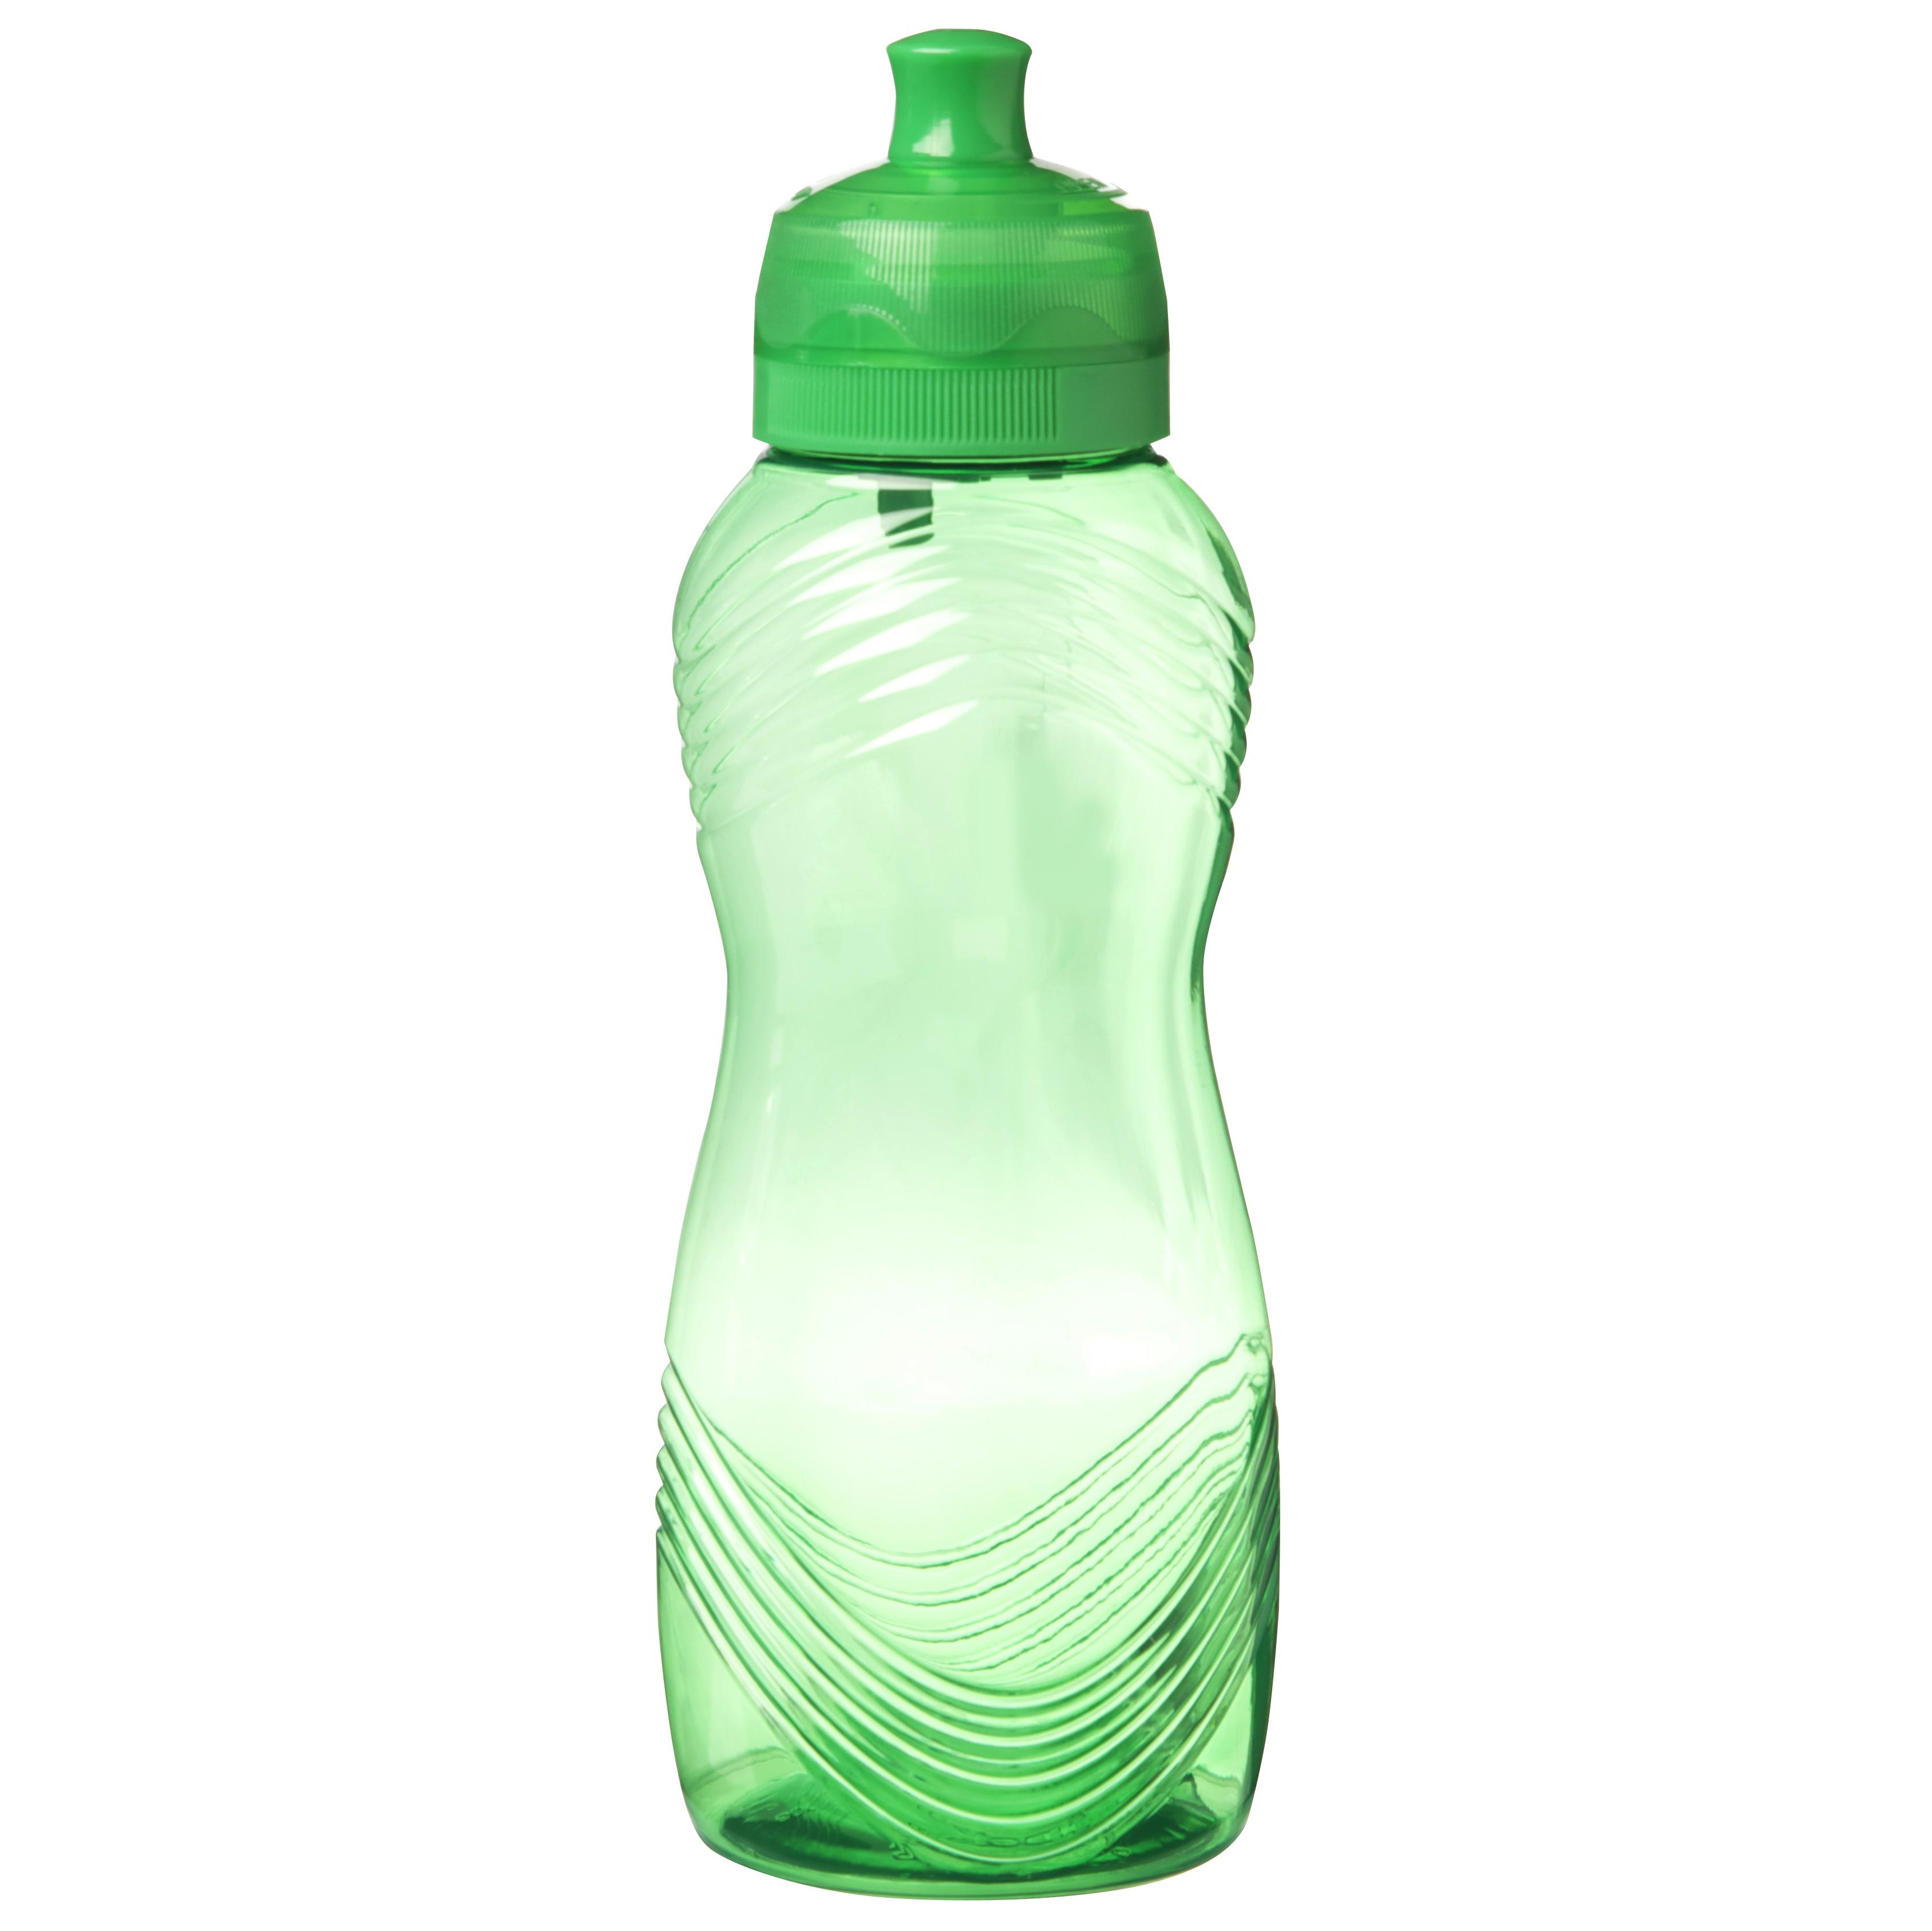 Audioplus botella de agua 600ml modelo 600 verde - Contenedores de agua ...